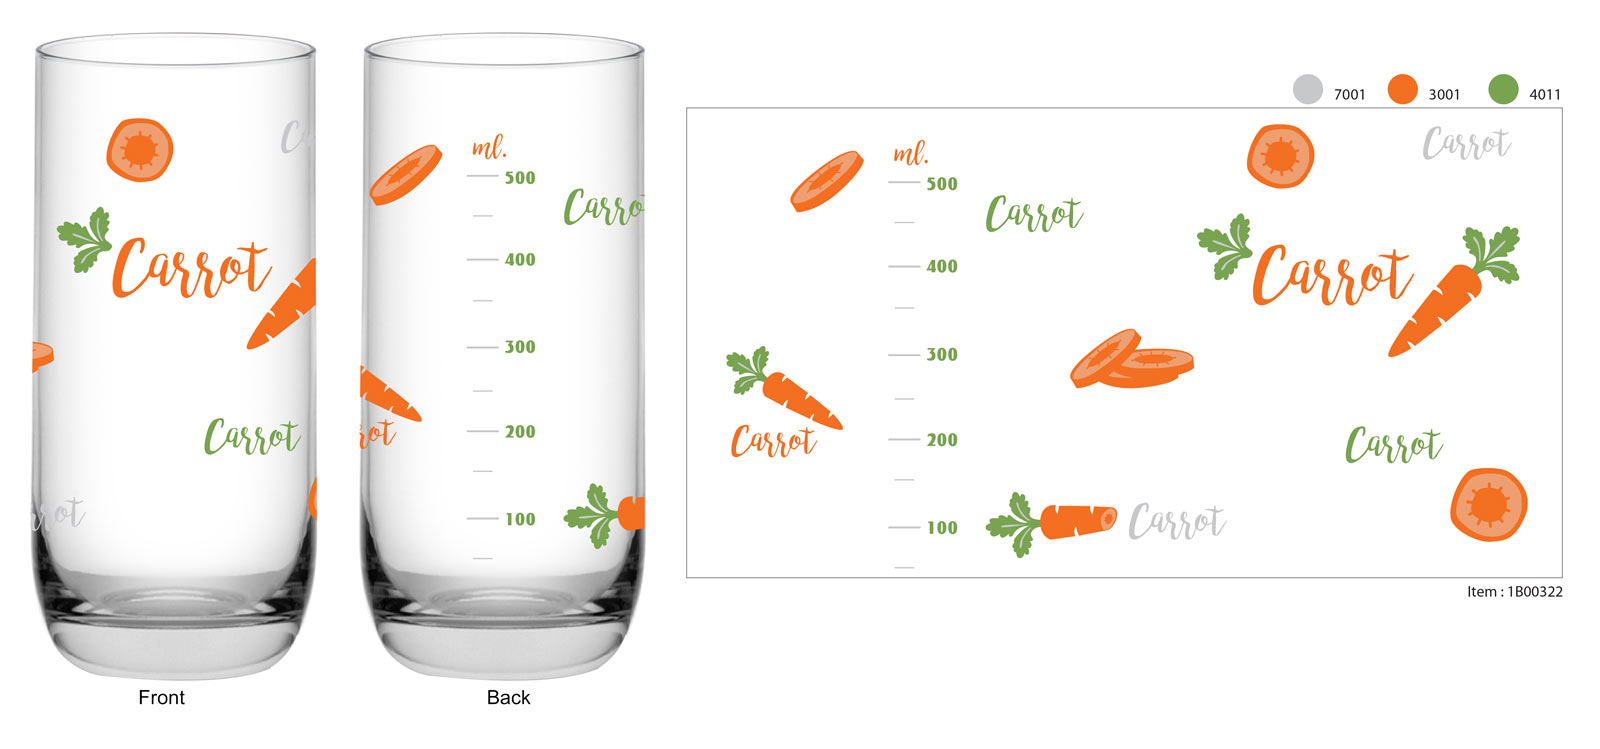 B00322- carrot